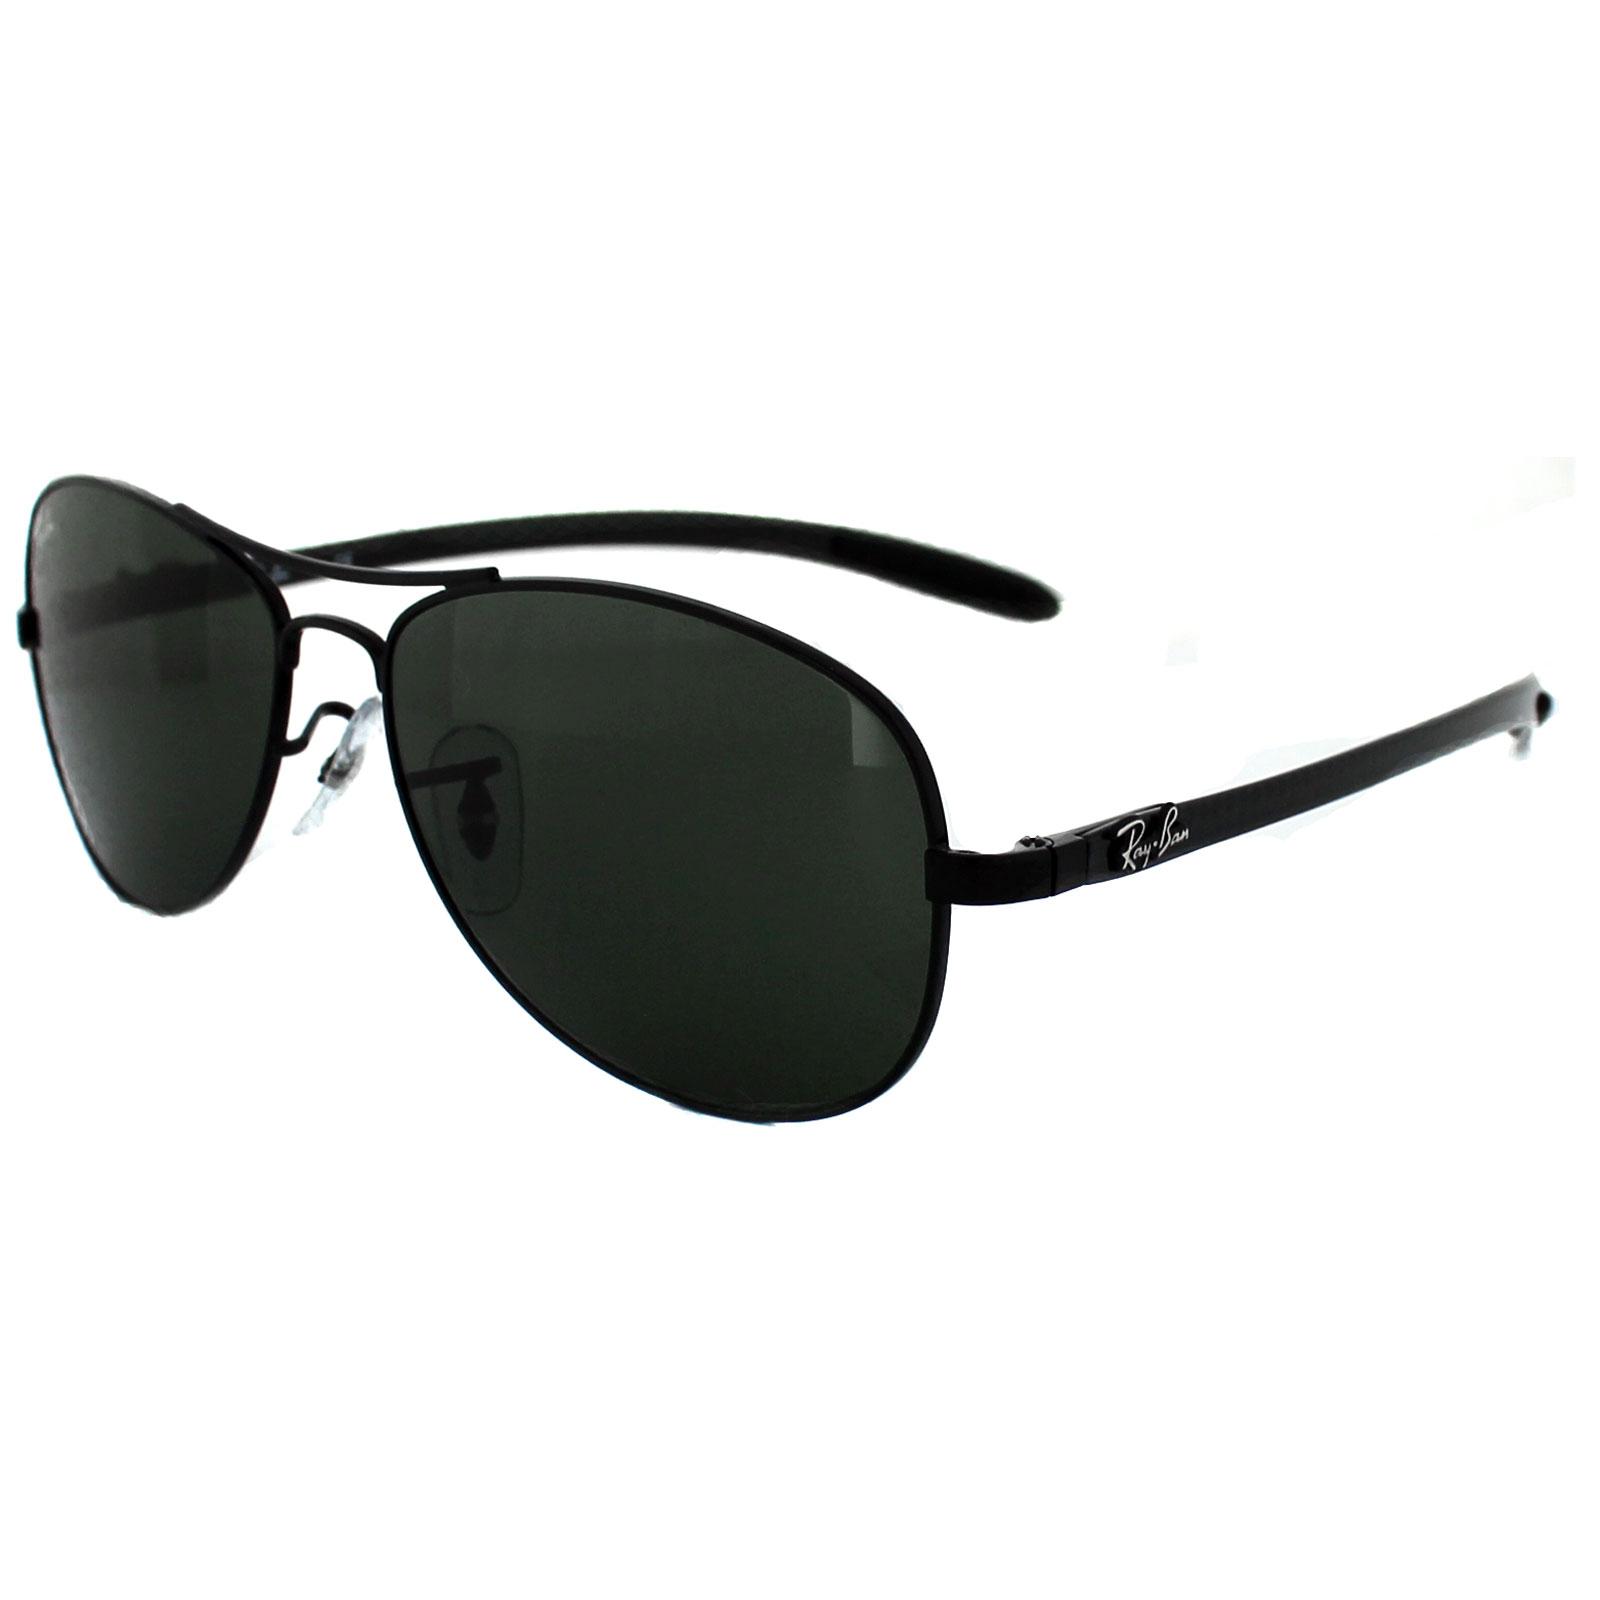 Cheap Ray Ban 8301 Sunglasses Discounted Sunglasses